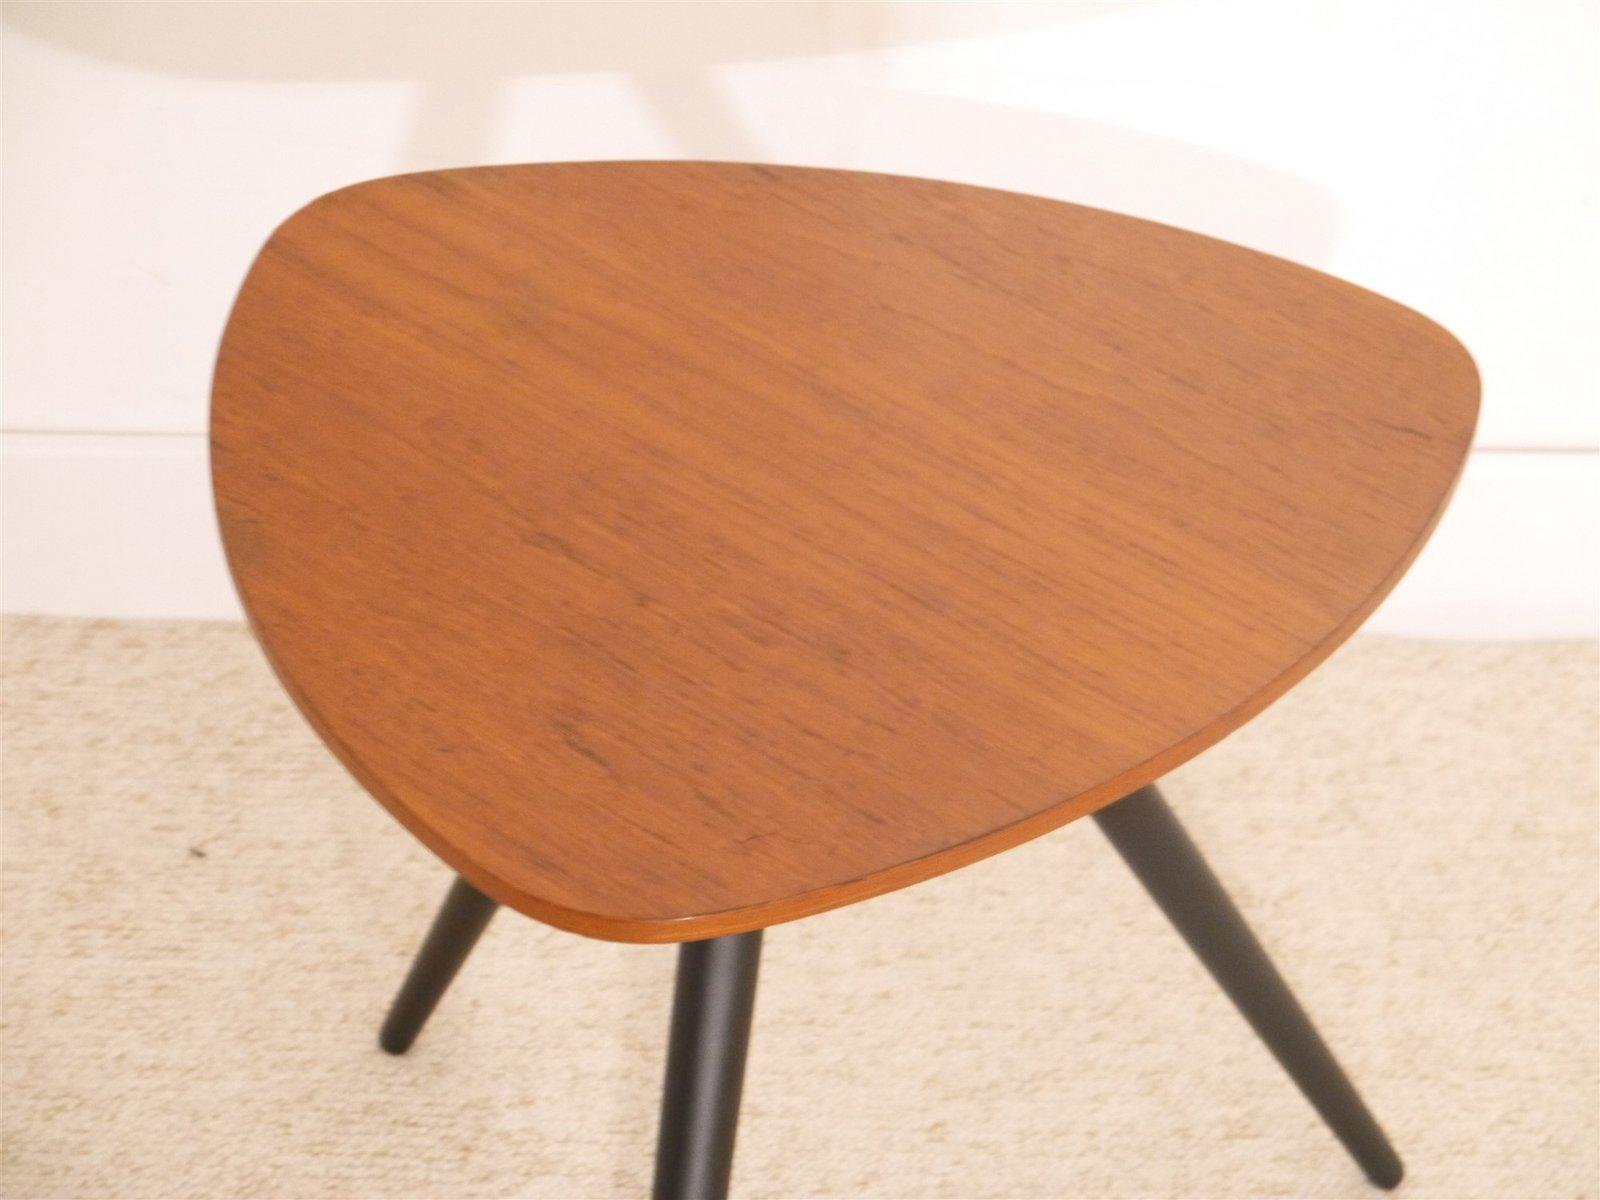 vintage scandinavian tripod side table in teak for sale at